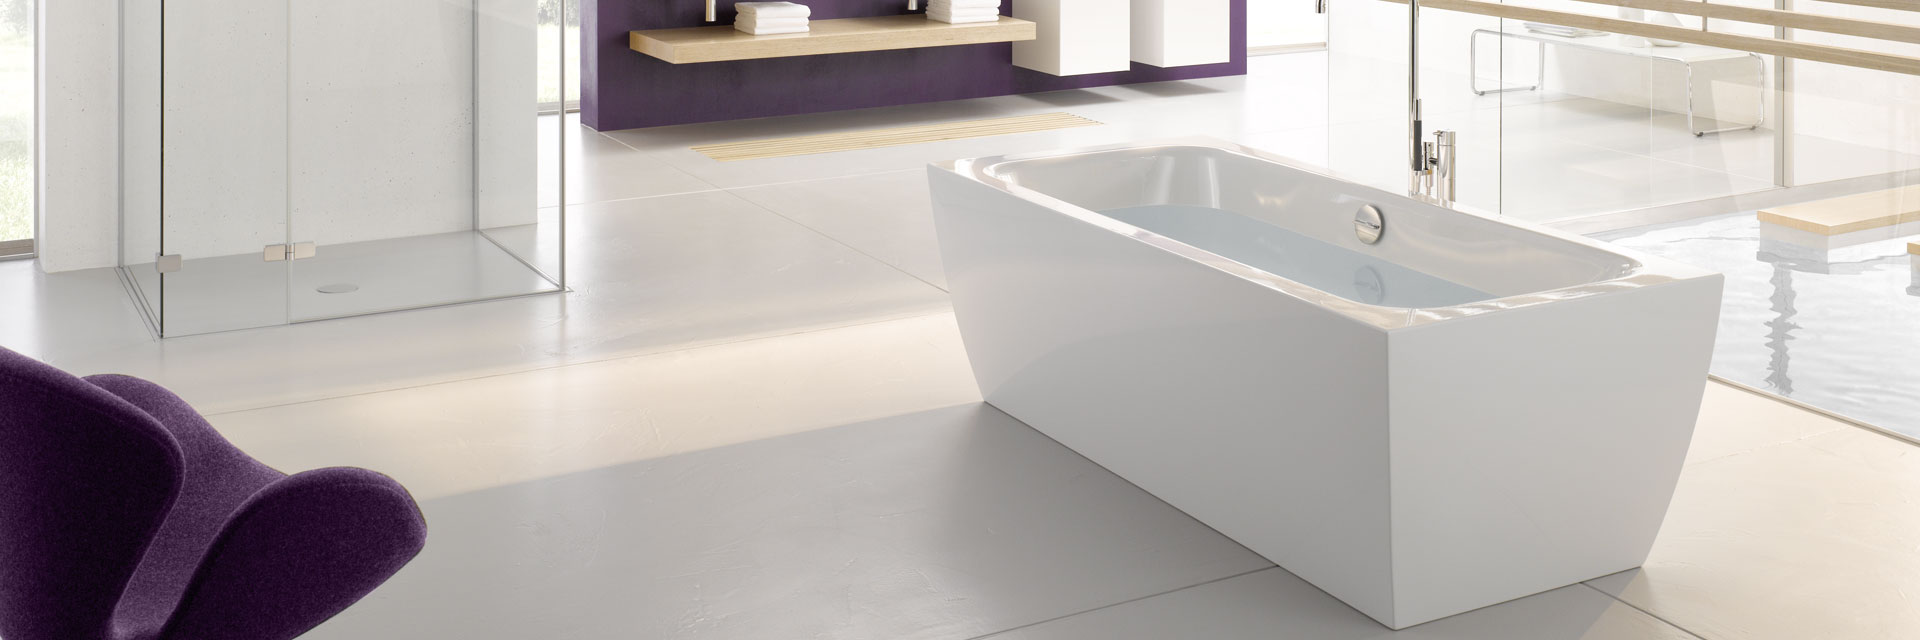 Bette steel and enamel - Herts Bathrooms